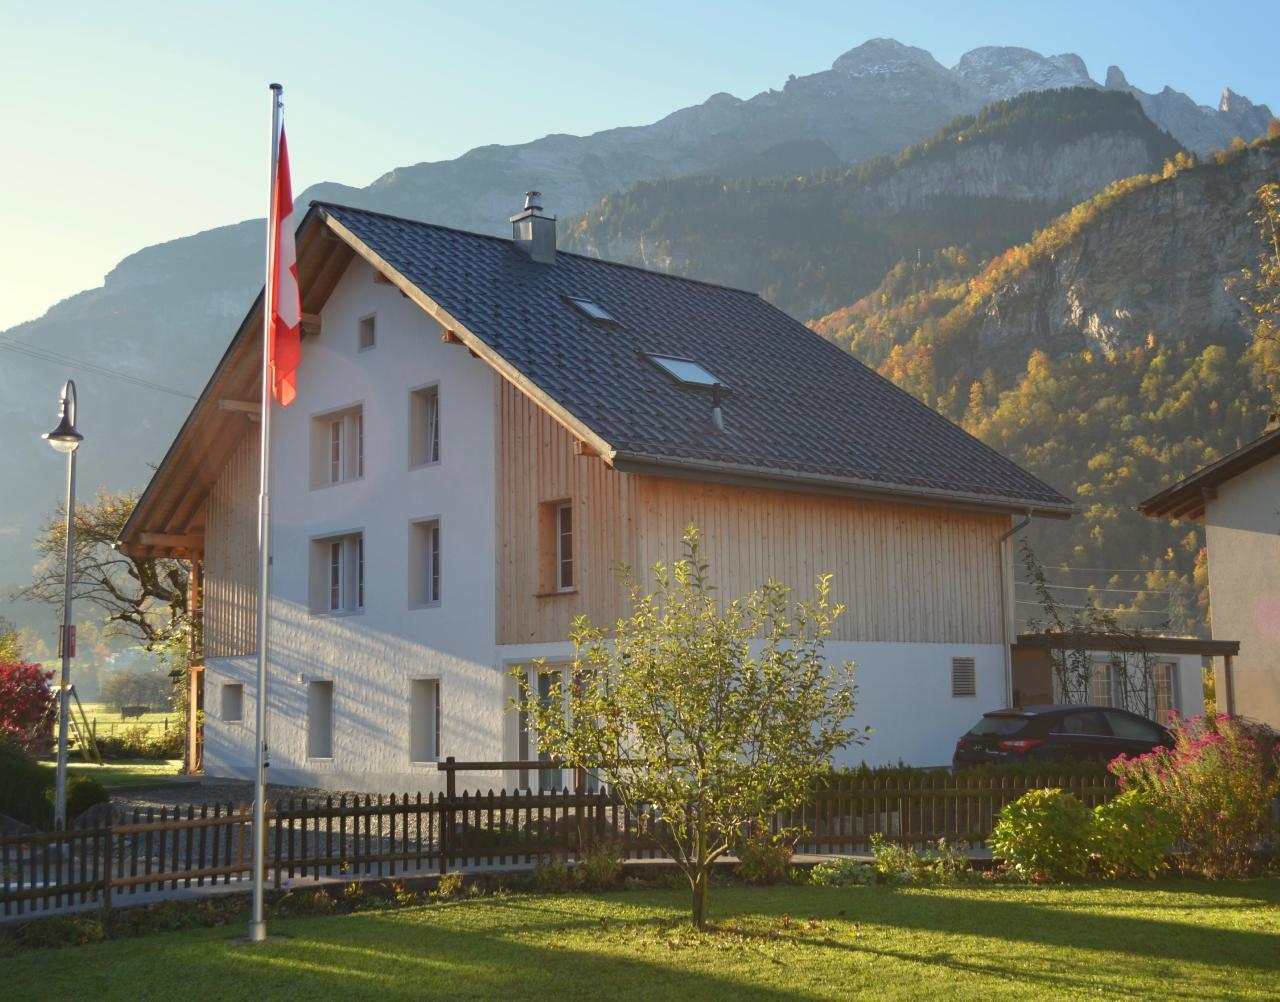 Holiday apartment mountain-panorama OG 4-Bettwohnung (2691570), Meiringen, Meiringen - Hasliberg, Bernese Oberland, Switzerland, picture 1